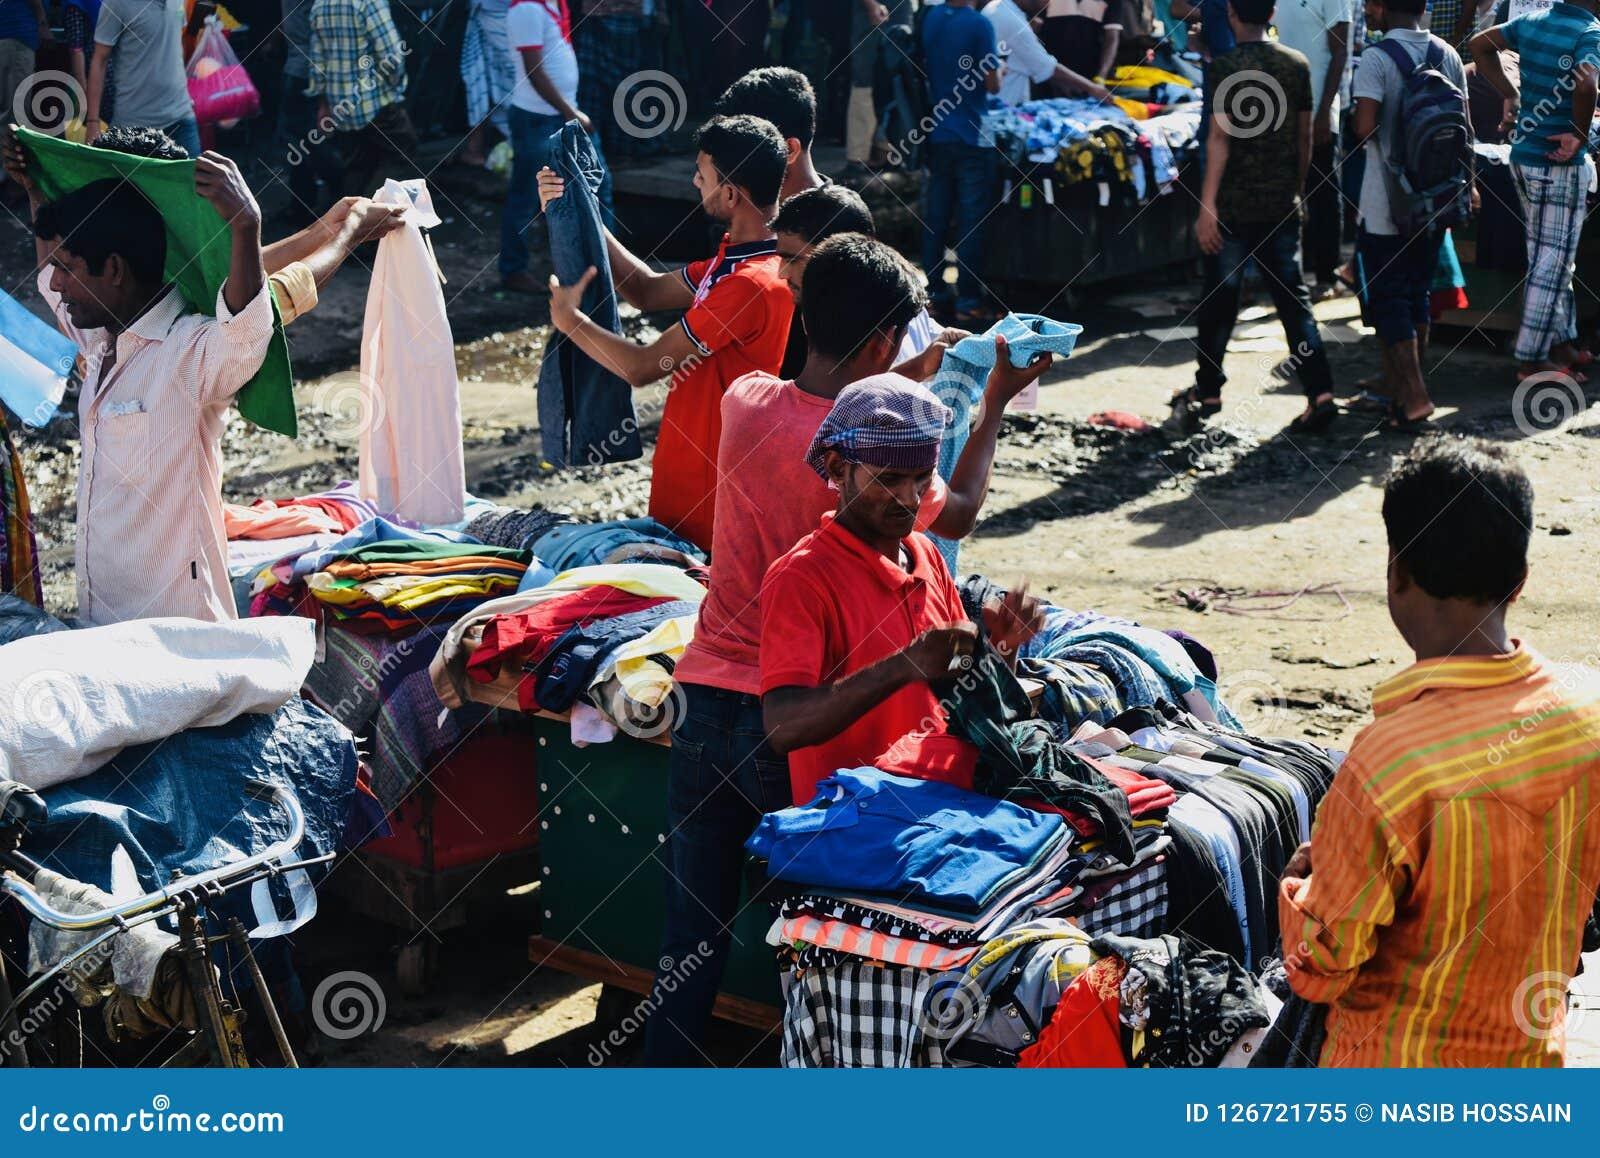 Street sellers selling garments around a street in Bangladesh